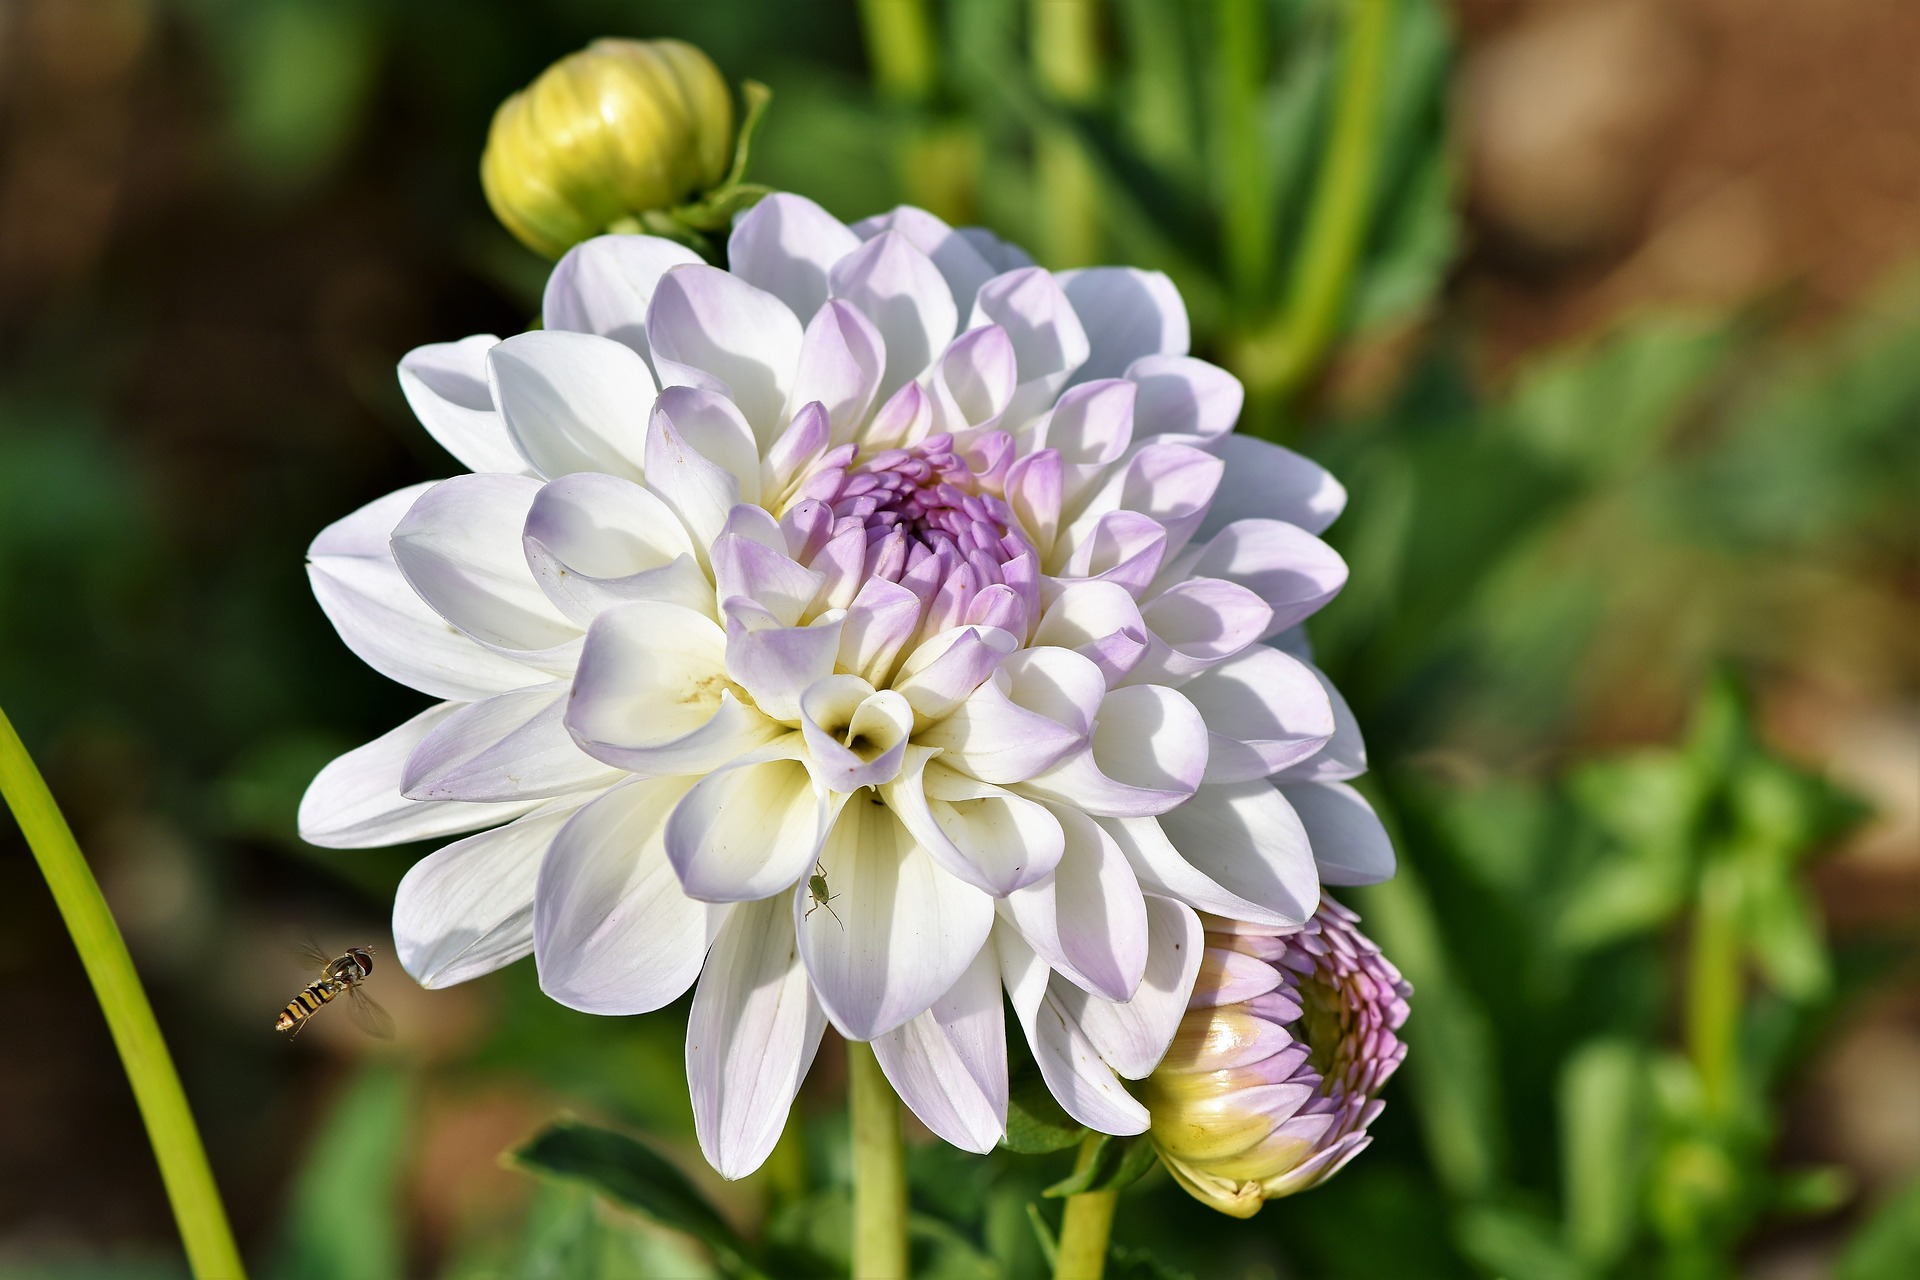 Should You Use Cultivars in a Pollinator Garden?